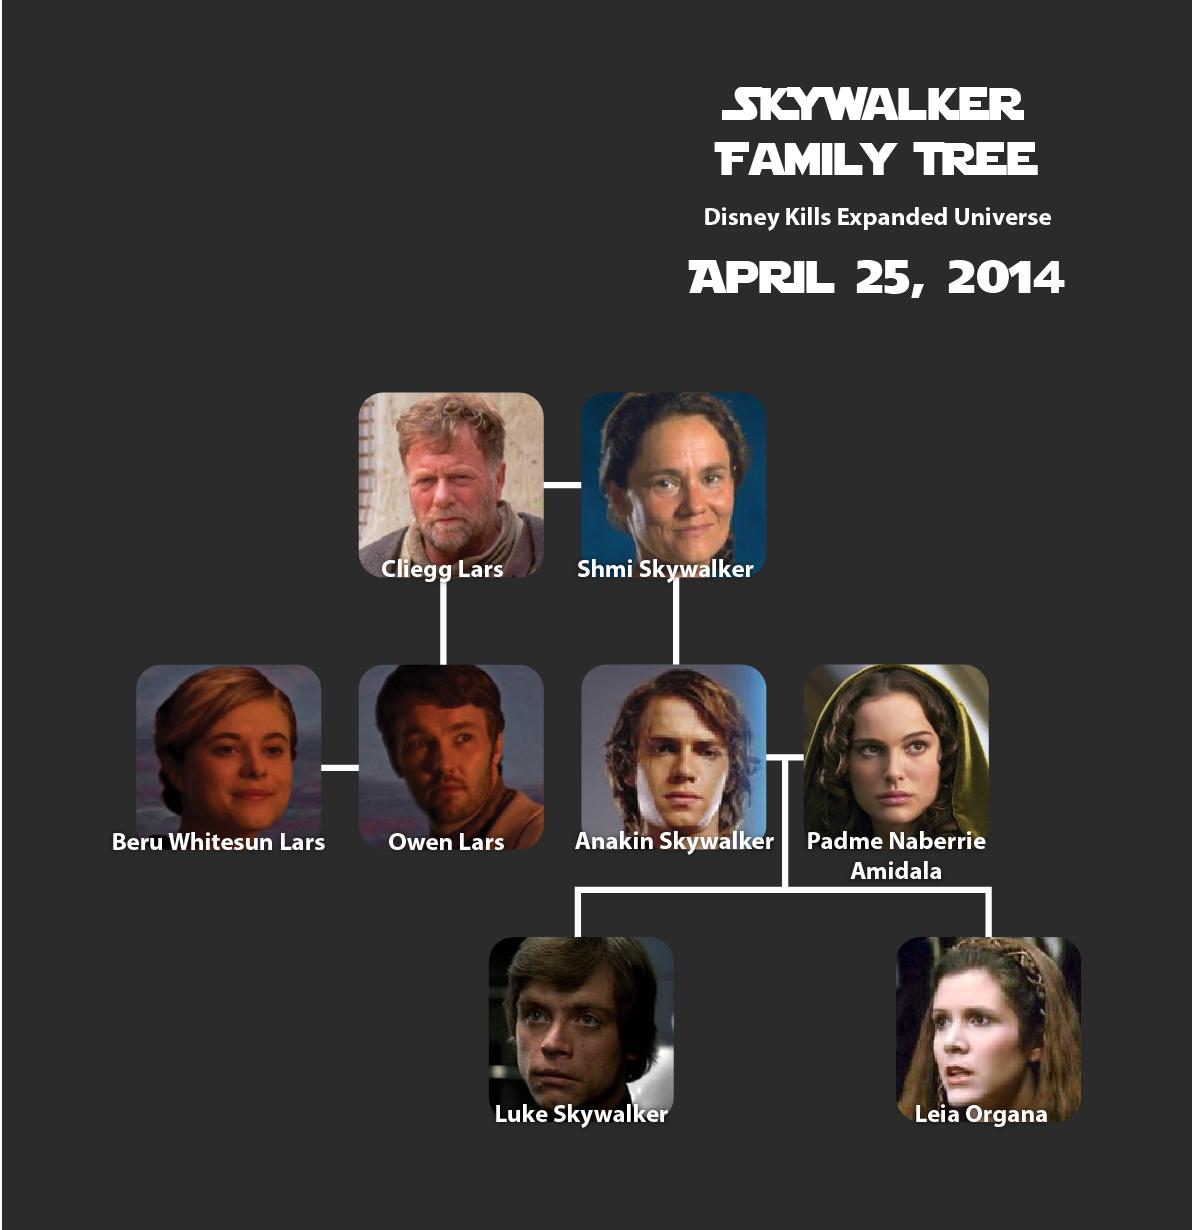 The Skywalker Family Over Time